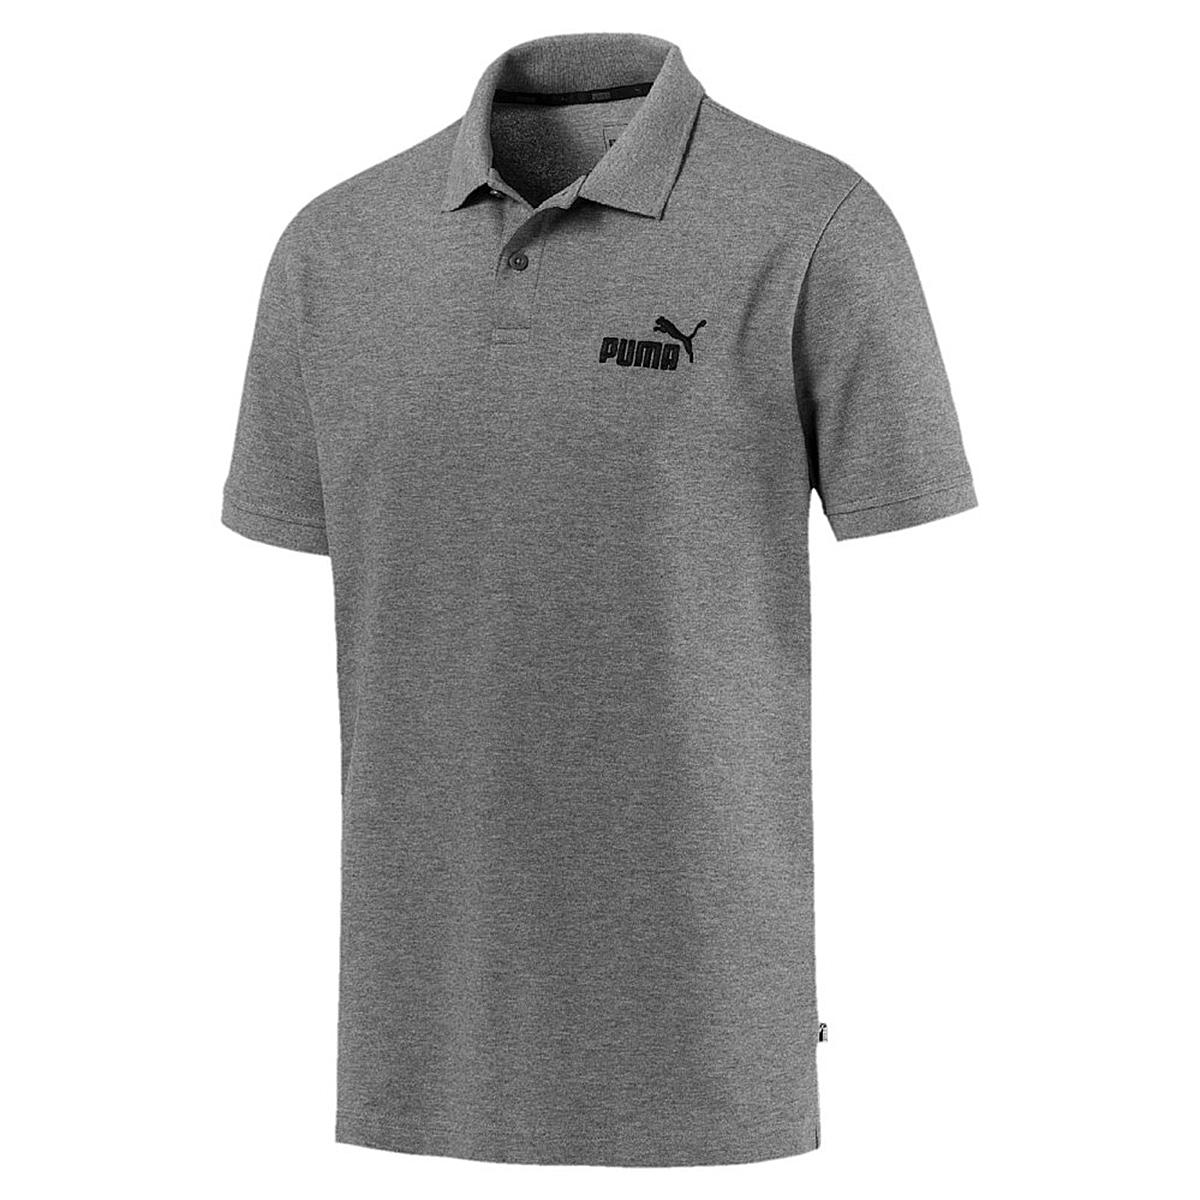 puma herren ess pique polo shirt grau 851759 herren. Black Bedroom Furniture Sets. Home Design Ideas